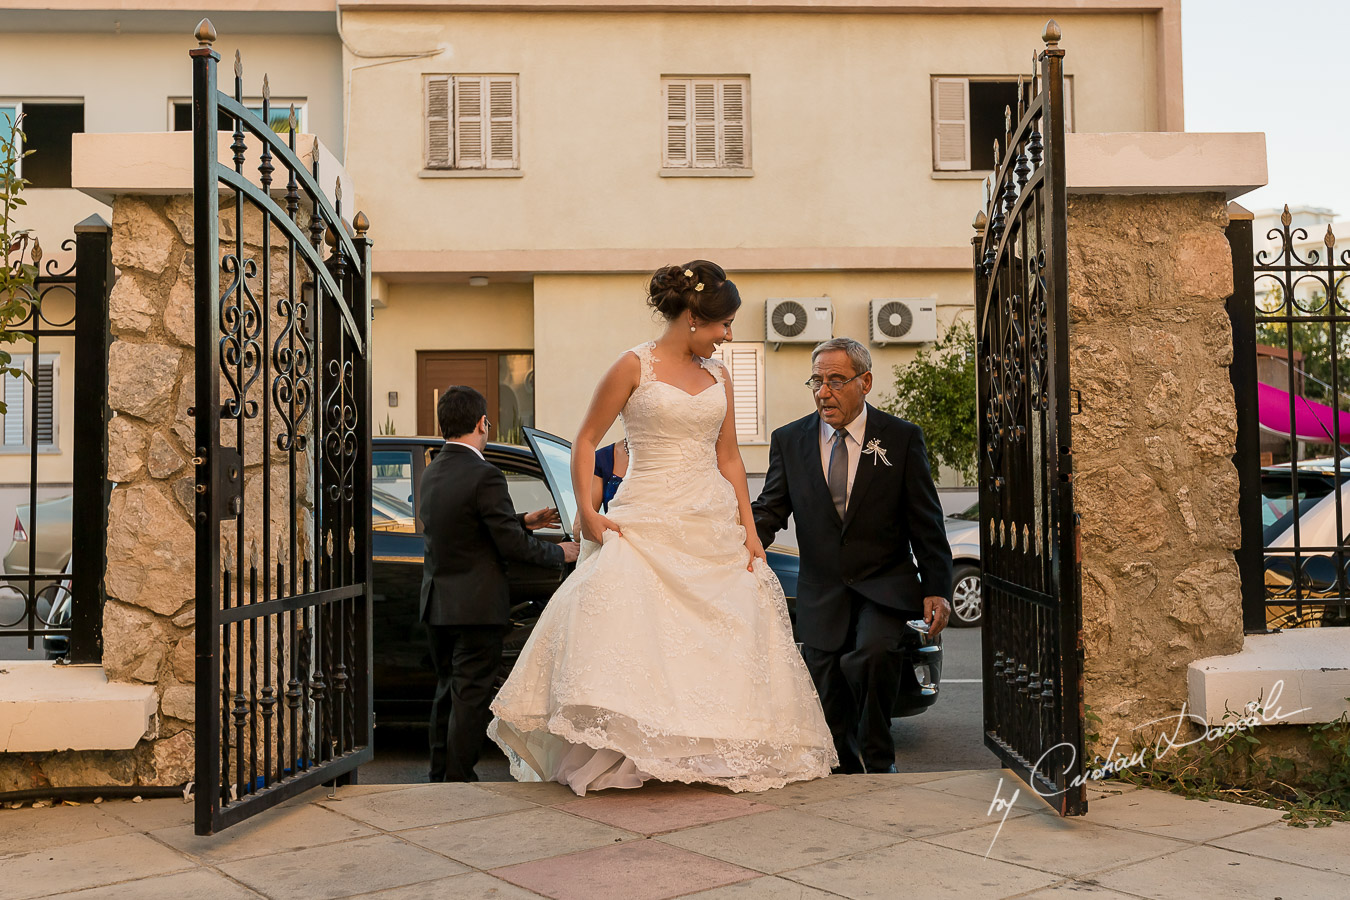 Beautiful Wedding Photography in Nicosia - Yiannis & Rodoula 19